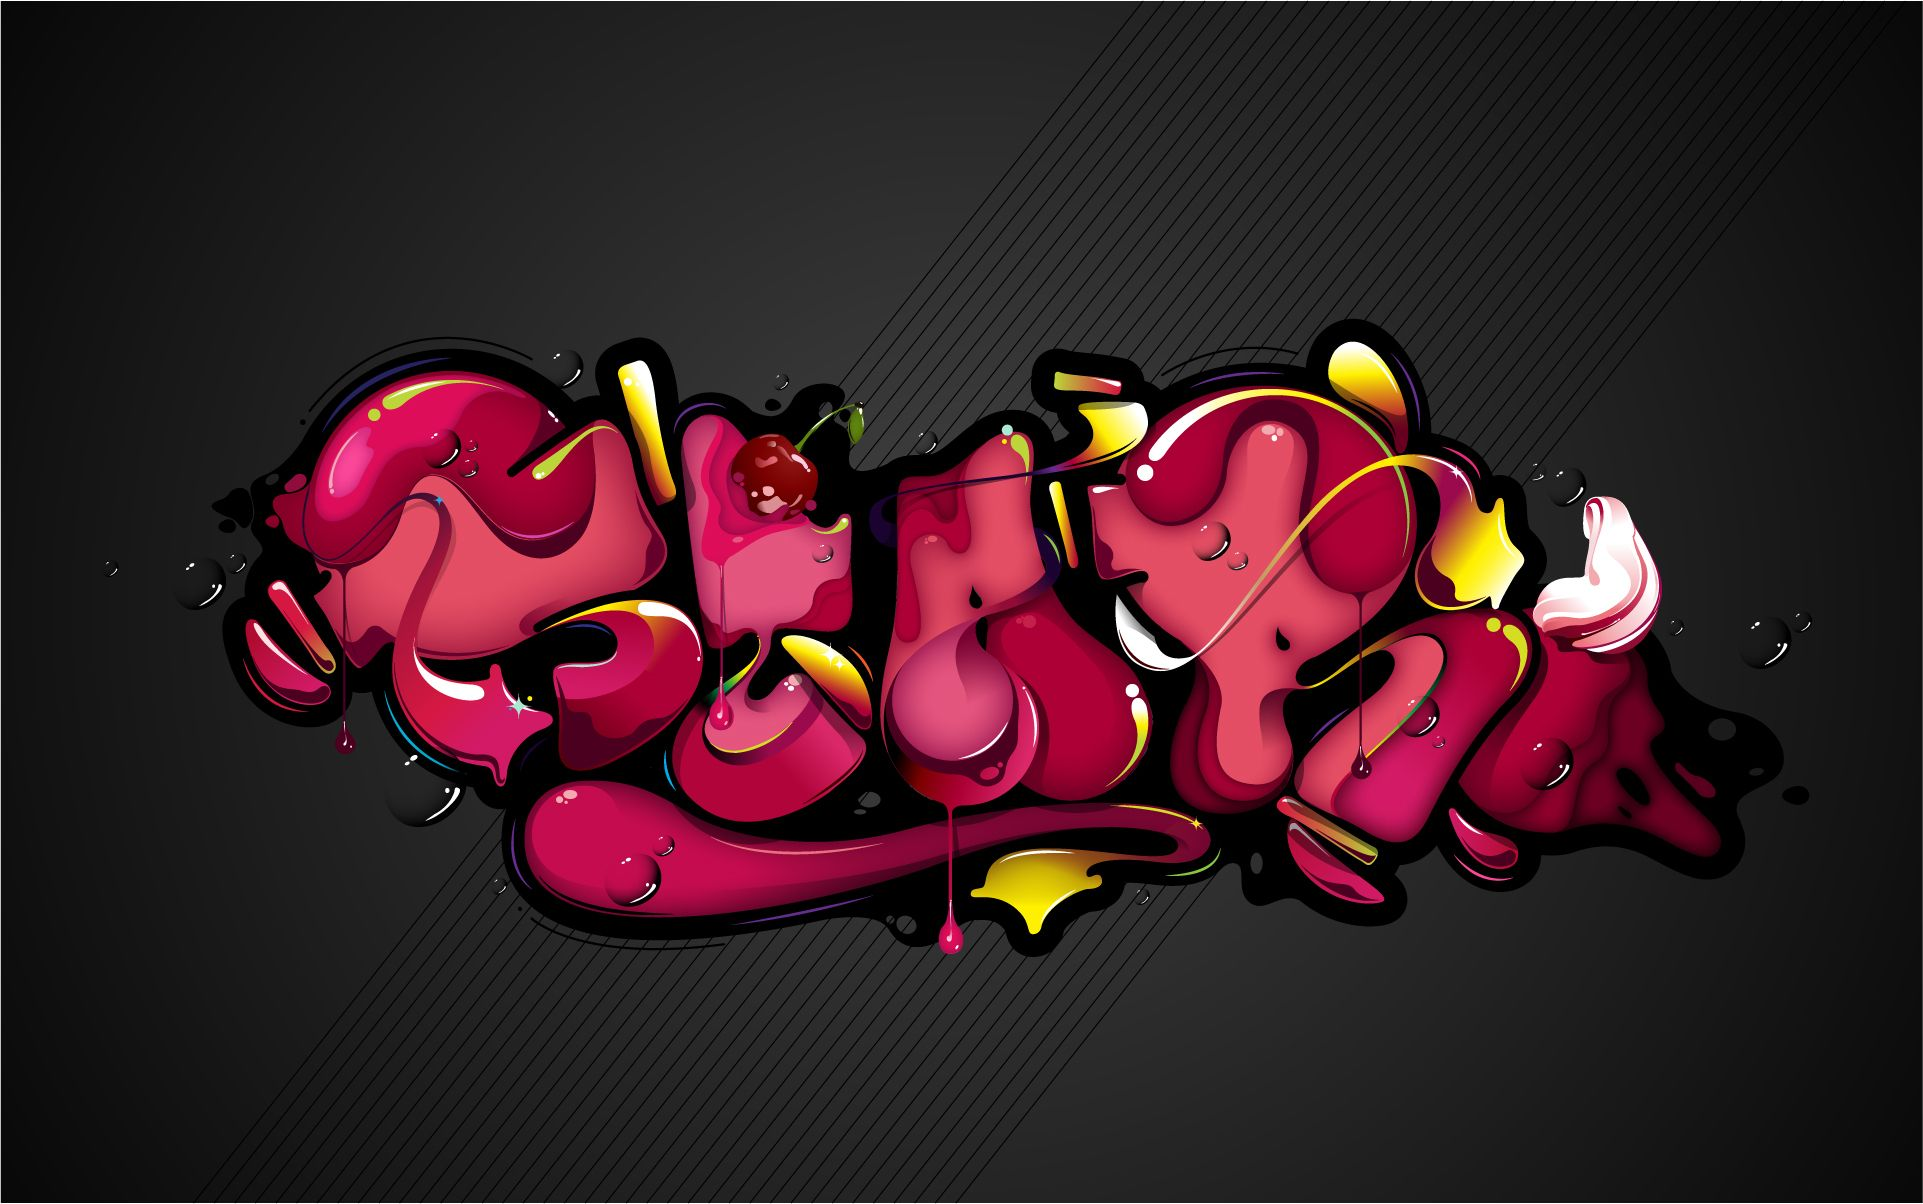 Graffiti art background - Cg Digital Art 3d Graffiti Color Urban Wallpaper Background